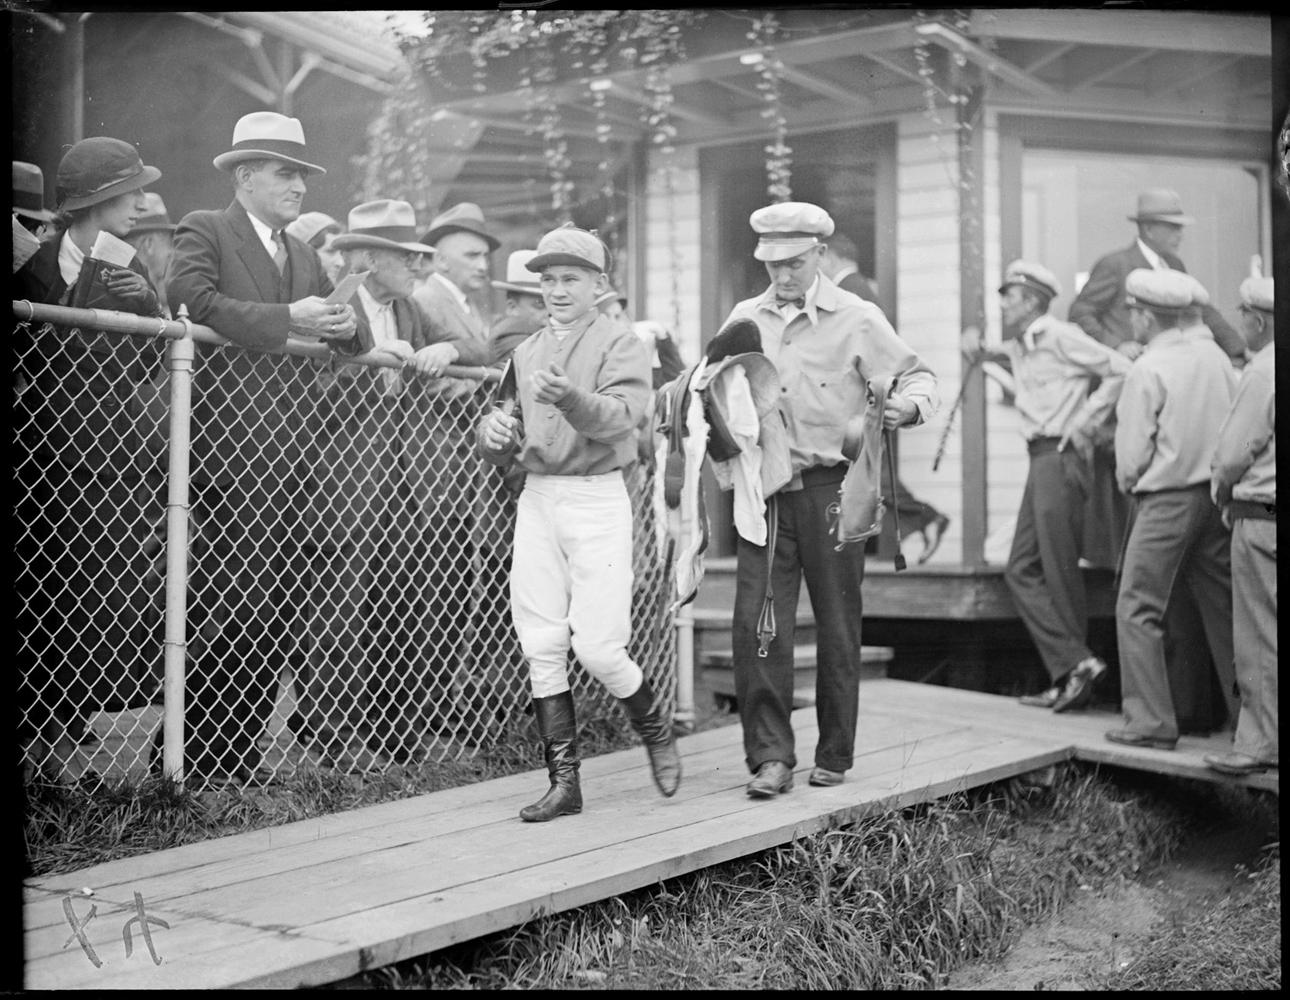 Jack Westrope at Rockingham, September 1933 (Courtesy of the Boston Public Library, Leslie Jones Collection)